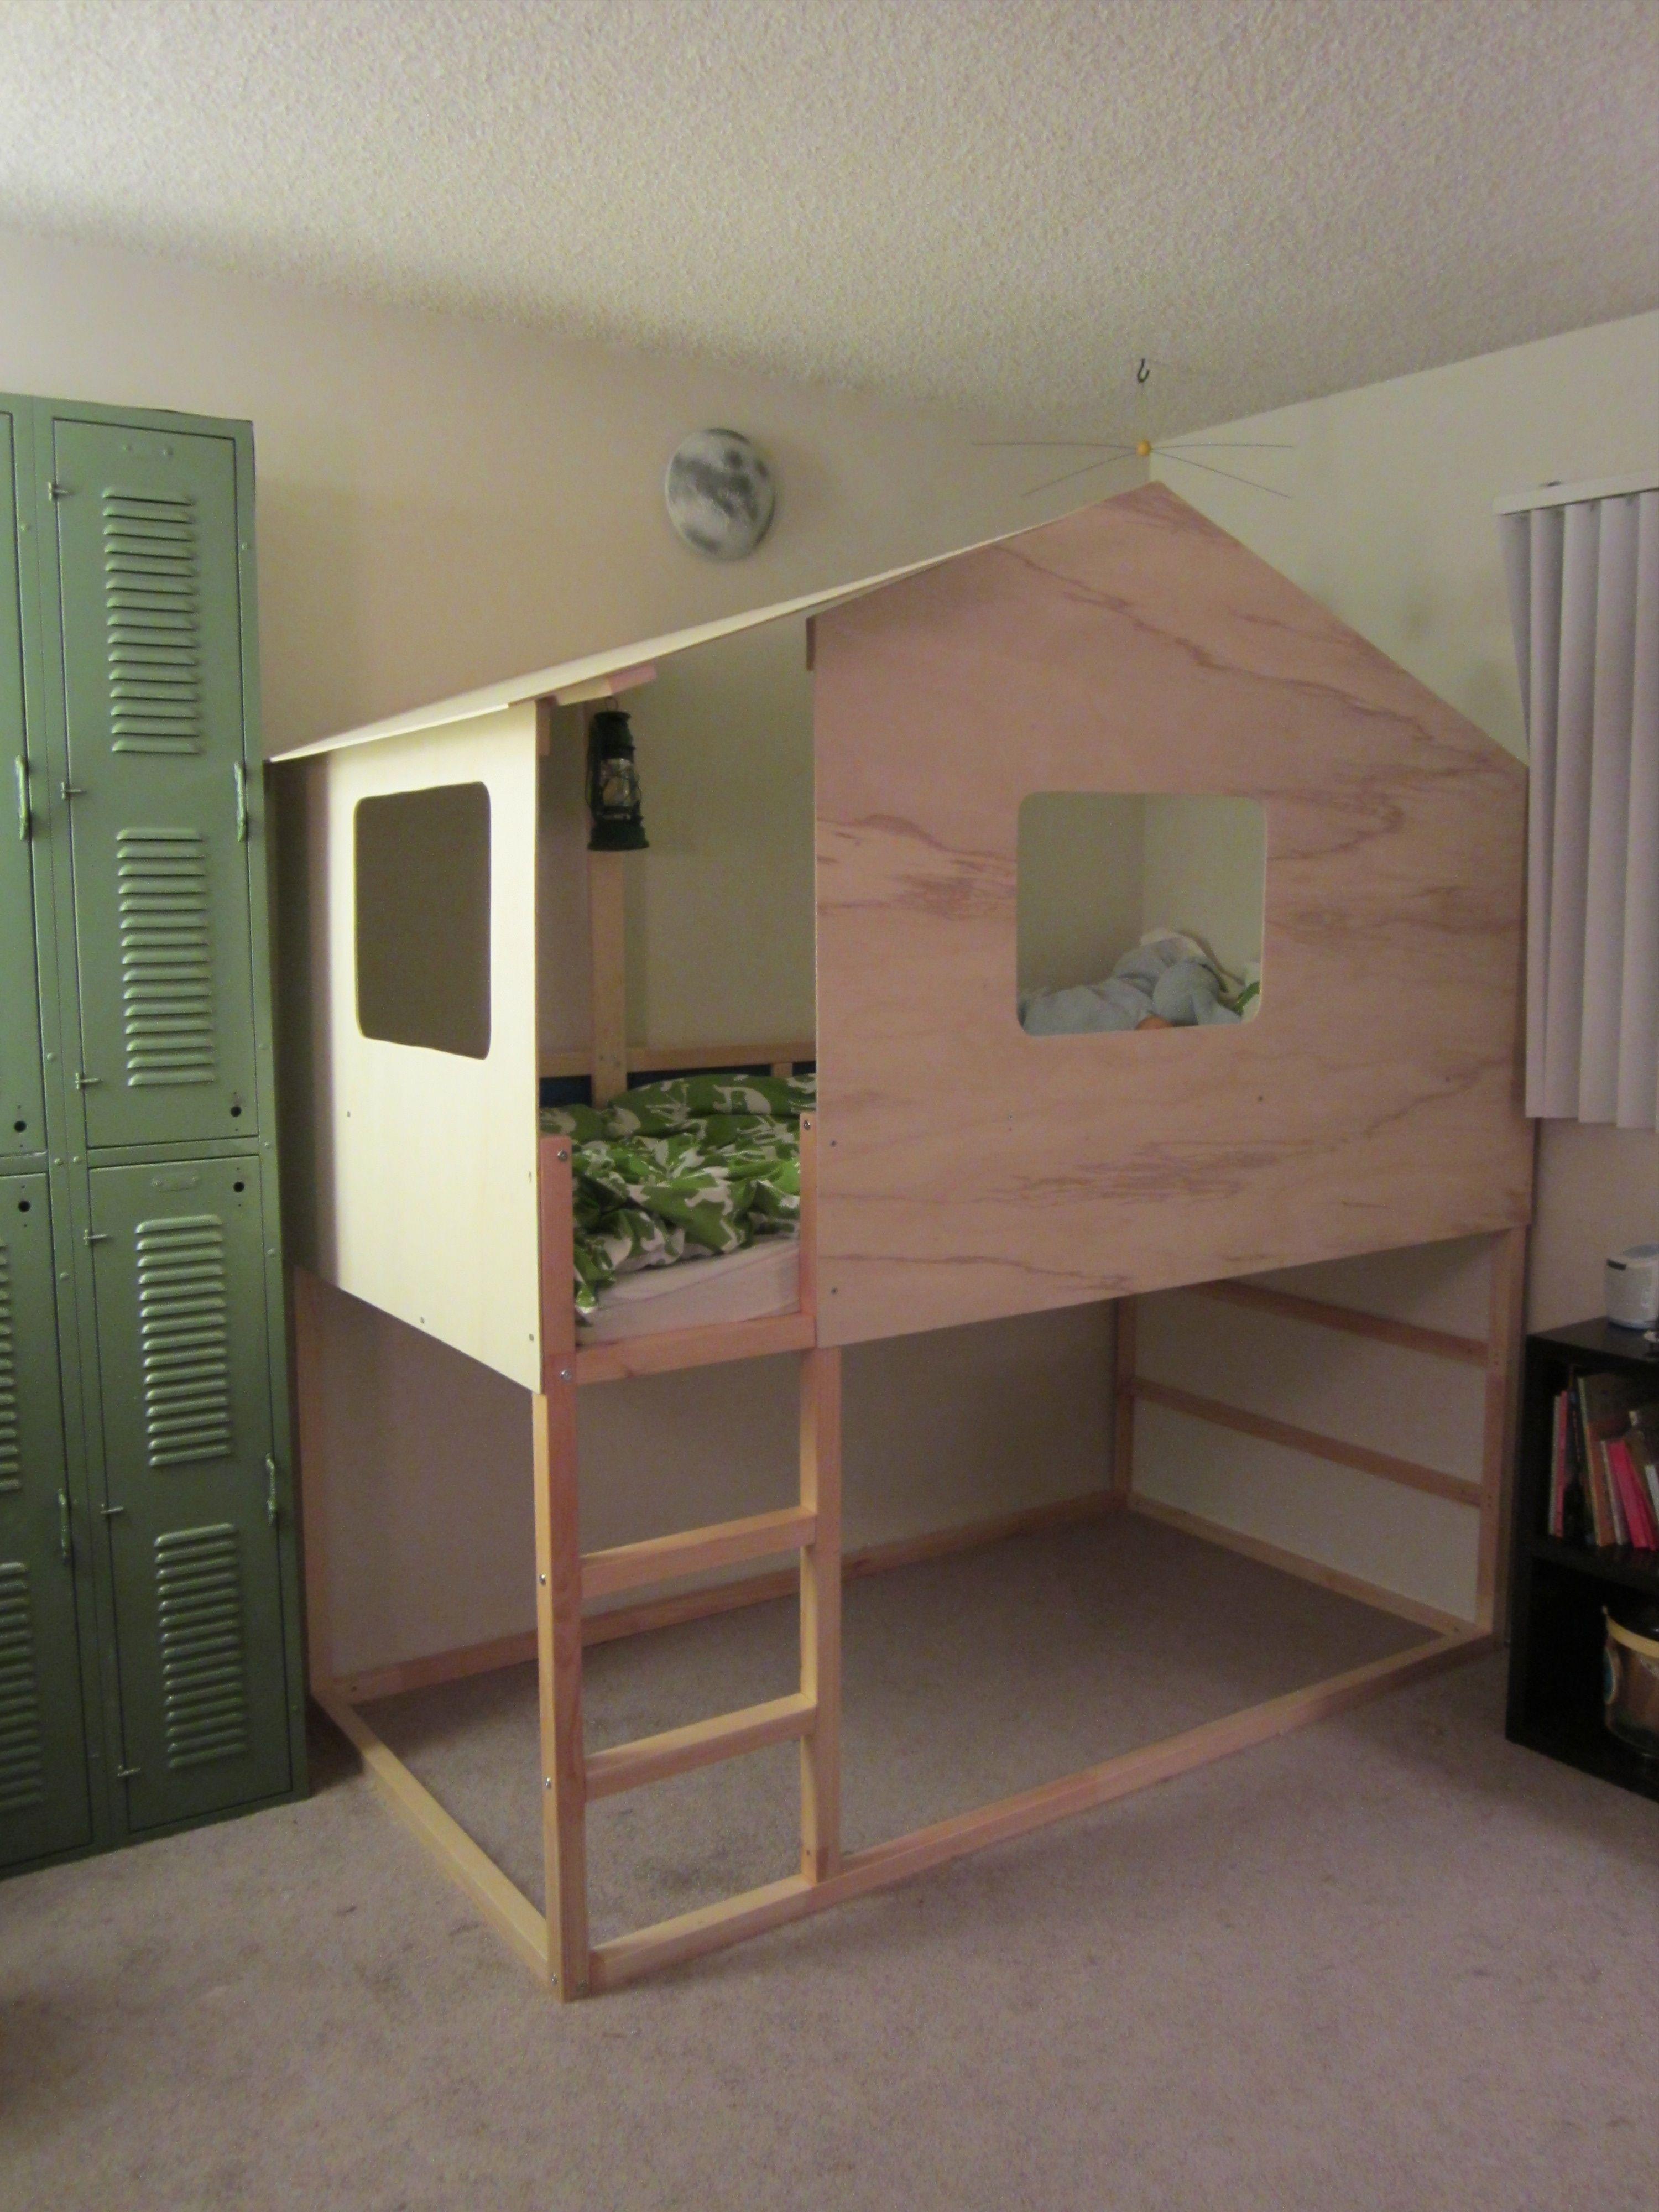 Kura loft bed ideas  IKEA Hack Kura Bed into Modern Cabin  Lils bed  Pinterest  Kura